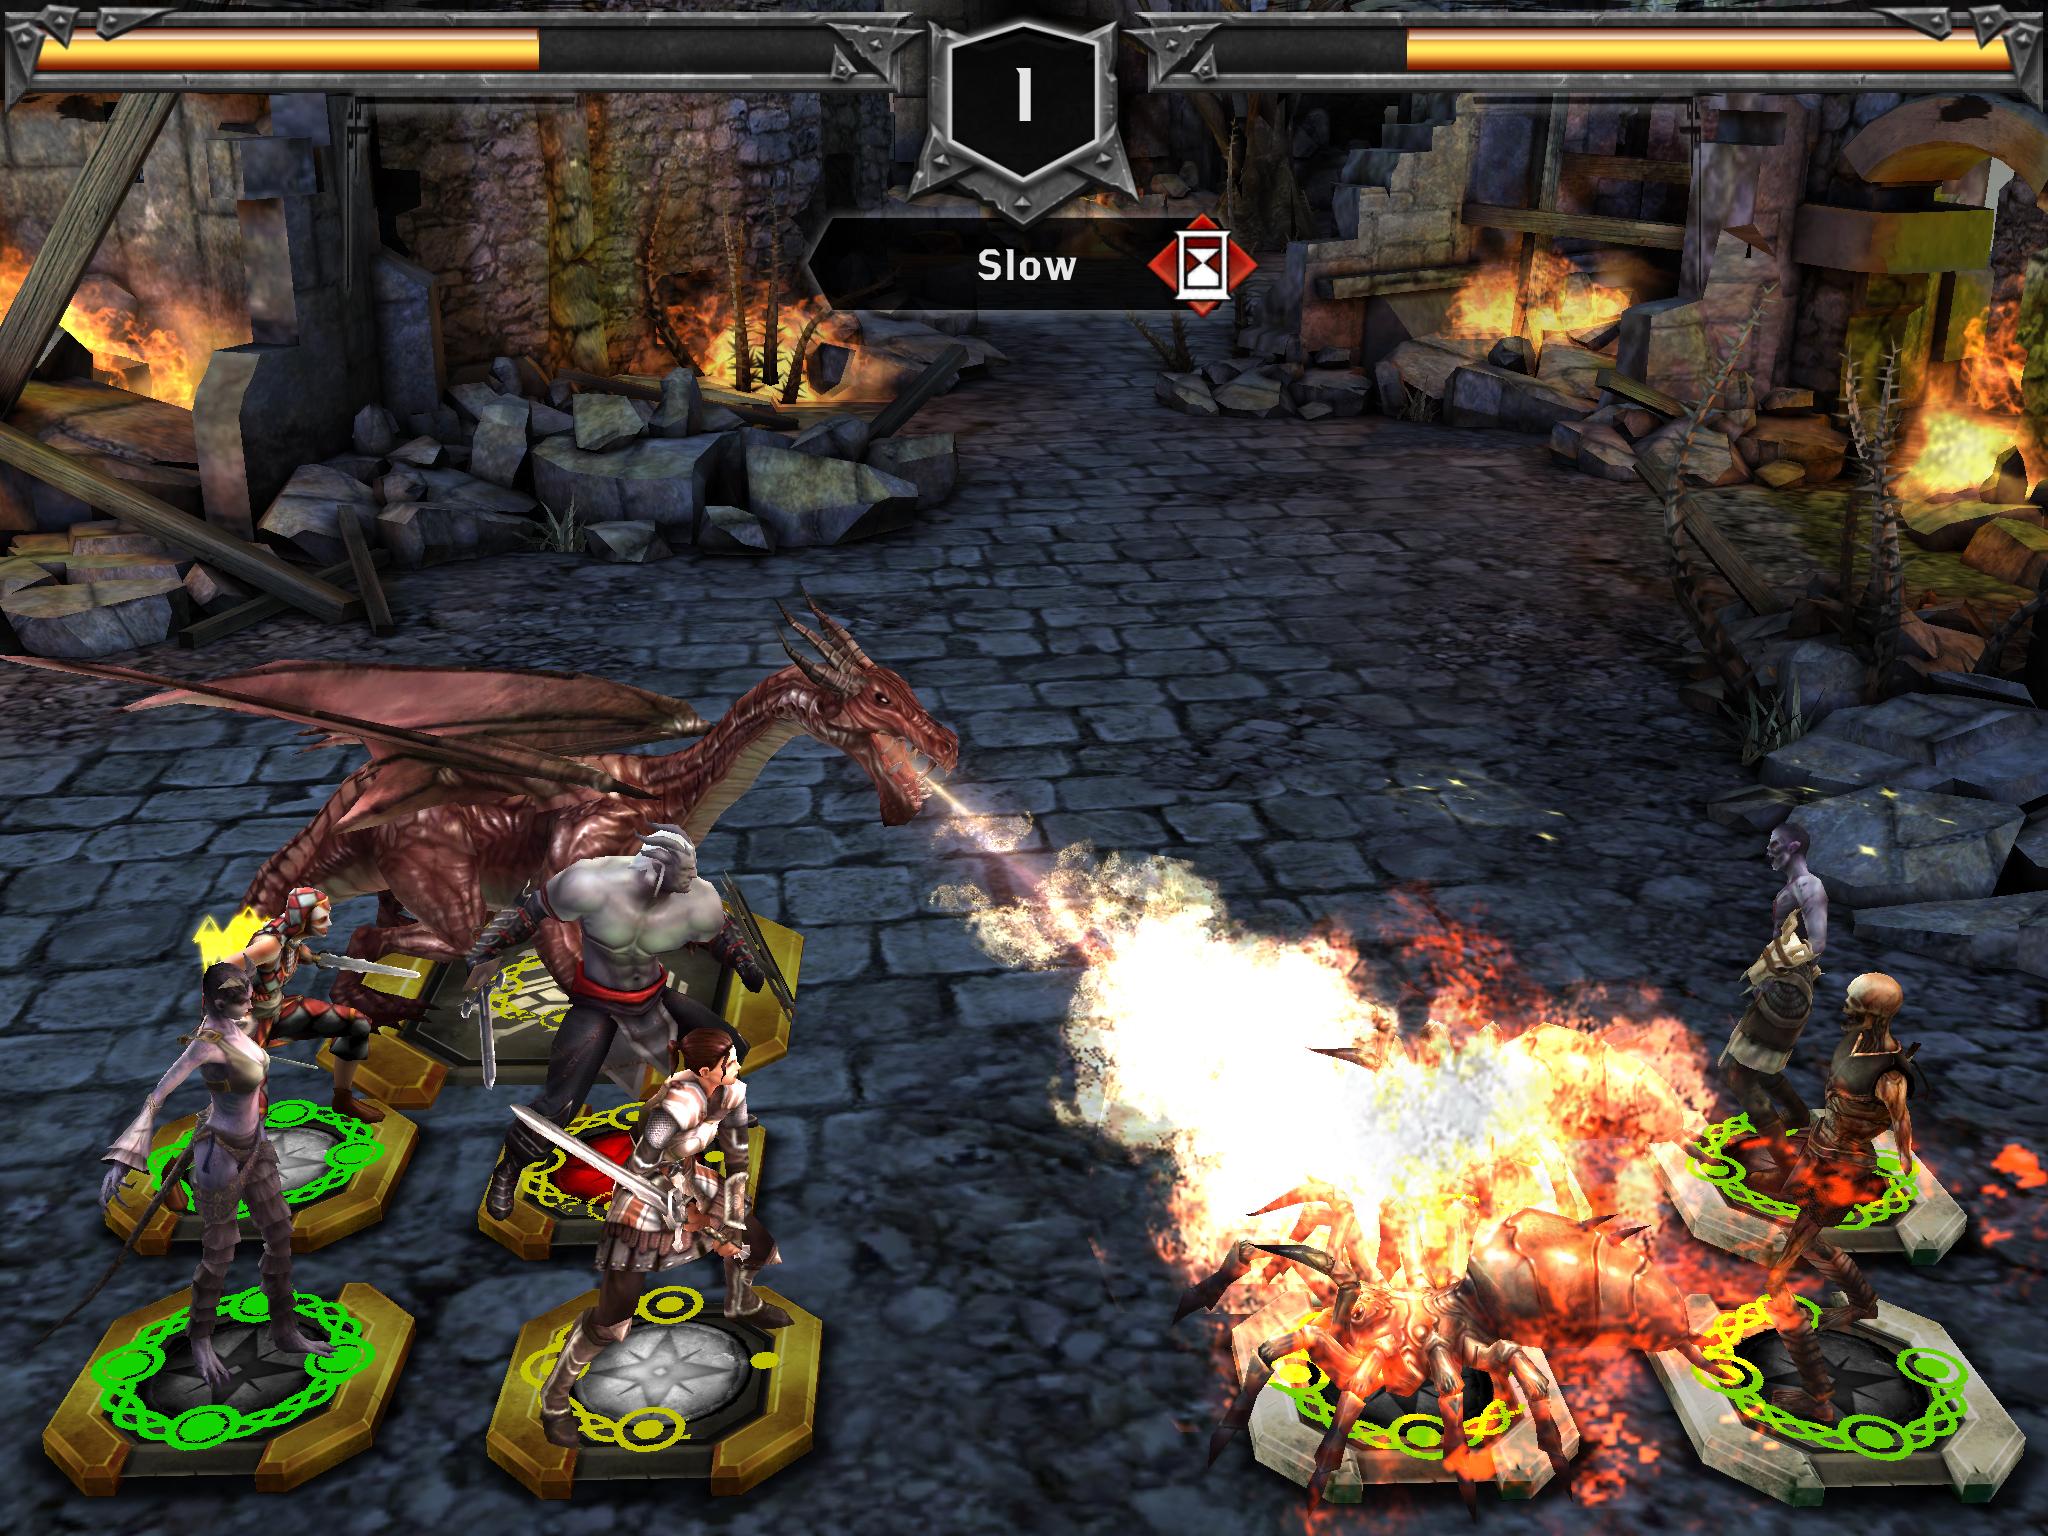 Oznámena mobilní free-to-play verze Dragon Age 86292